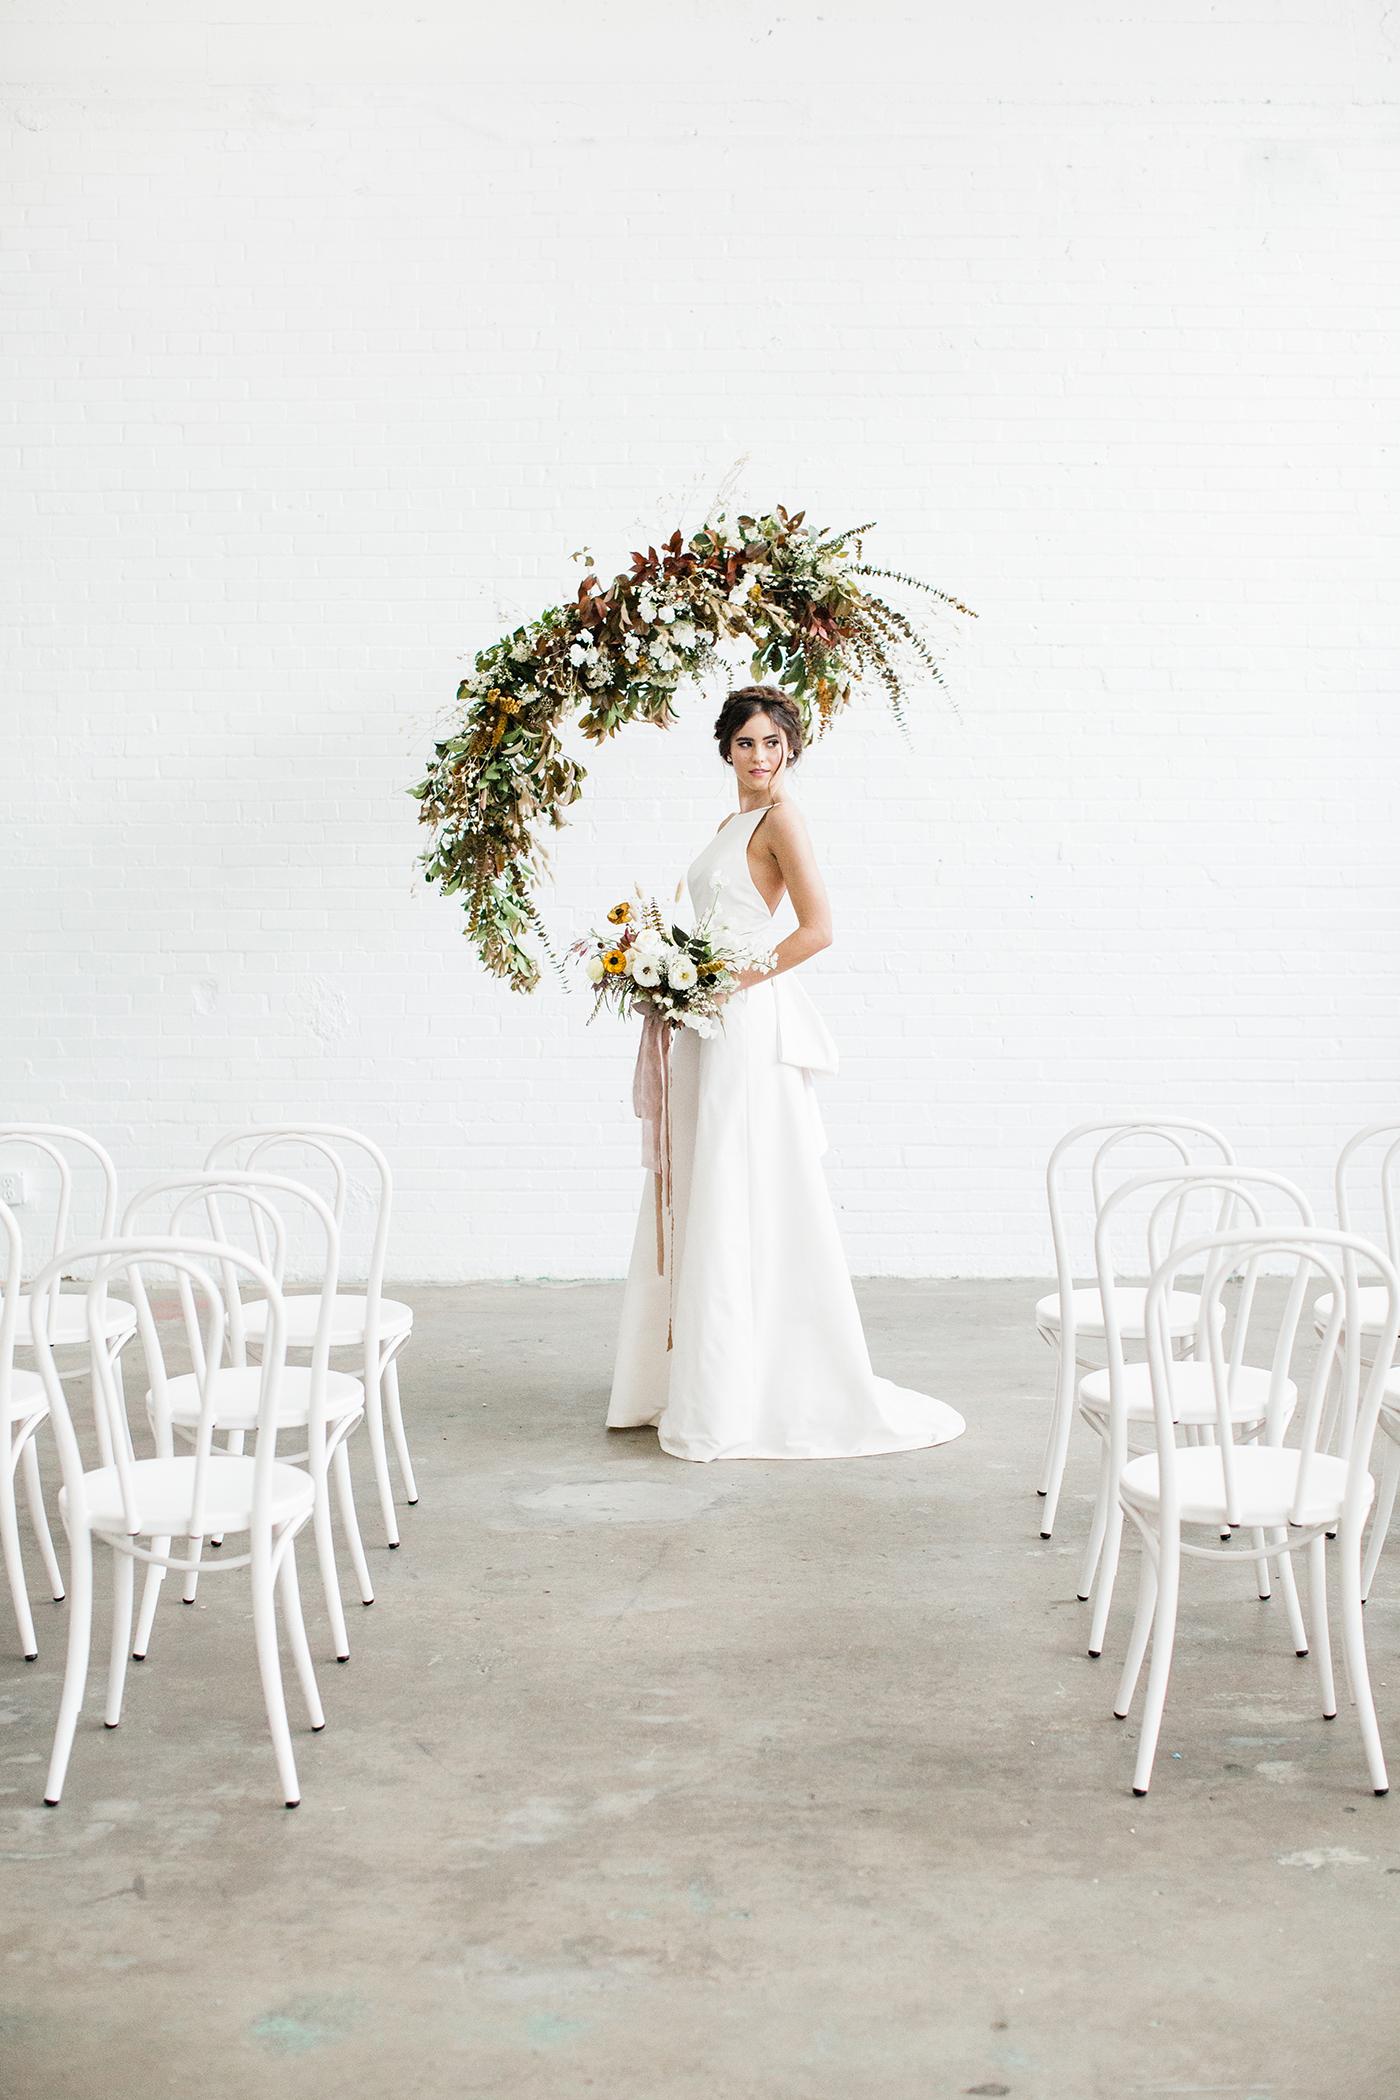 Wedding Floral Design Dallas - Olive Grove Design - Mimimalist Fall Wedding - 00033.jpg